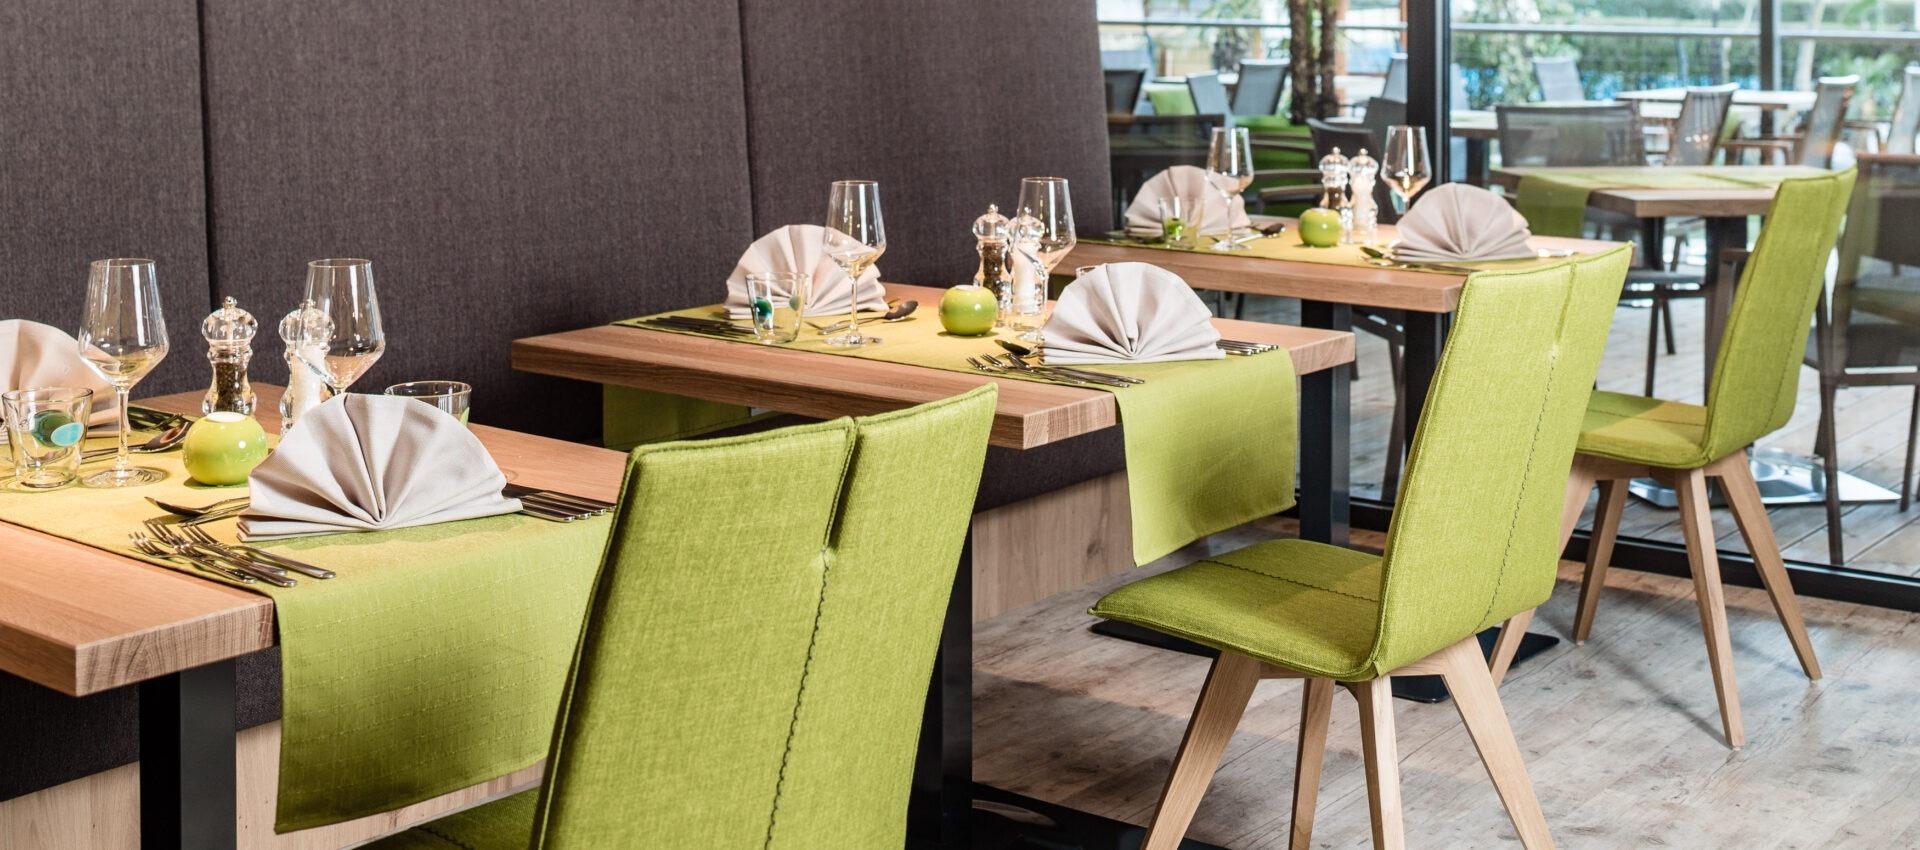 Restaurant 4 Sterne Hotel in Lana Pfeiss - Meran - Südtirol